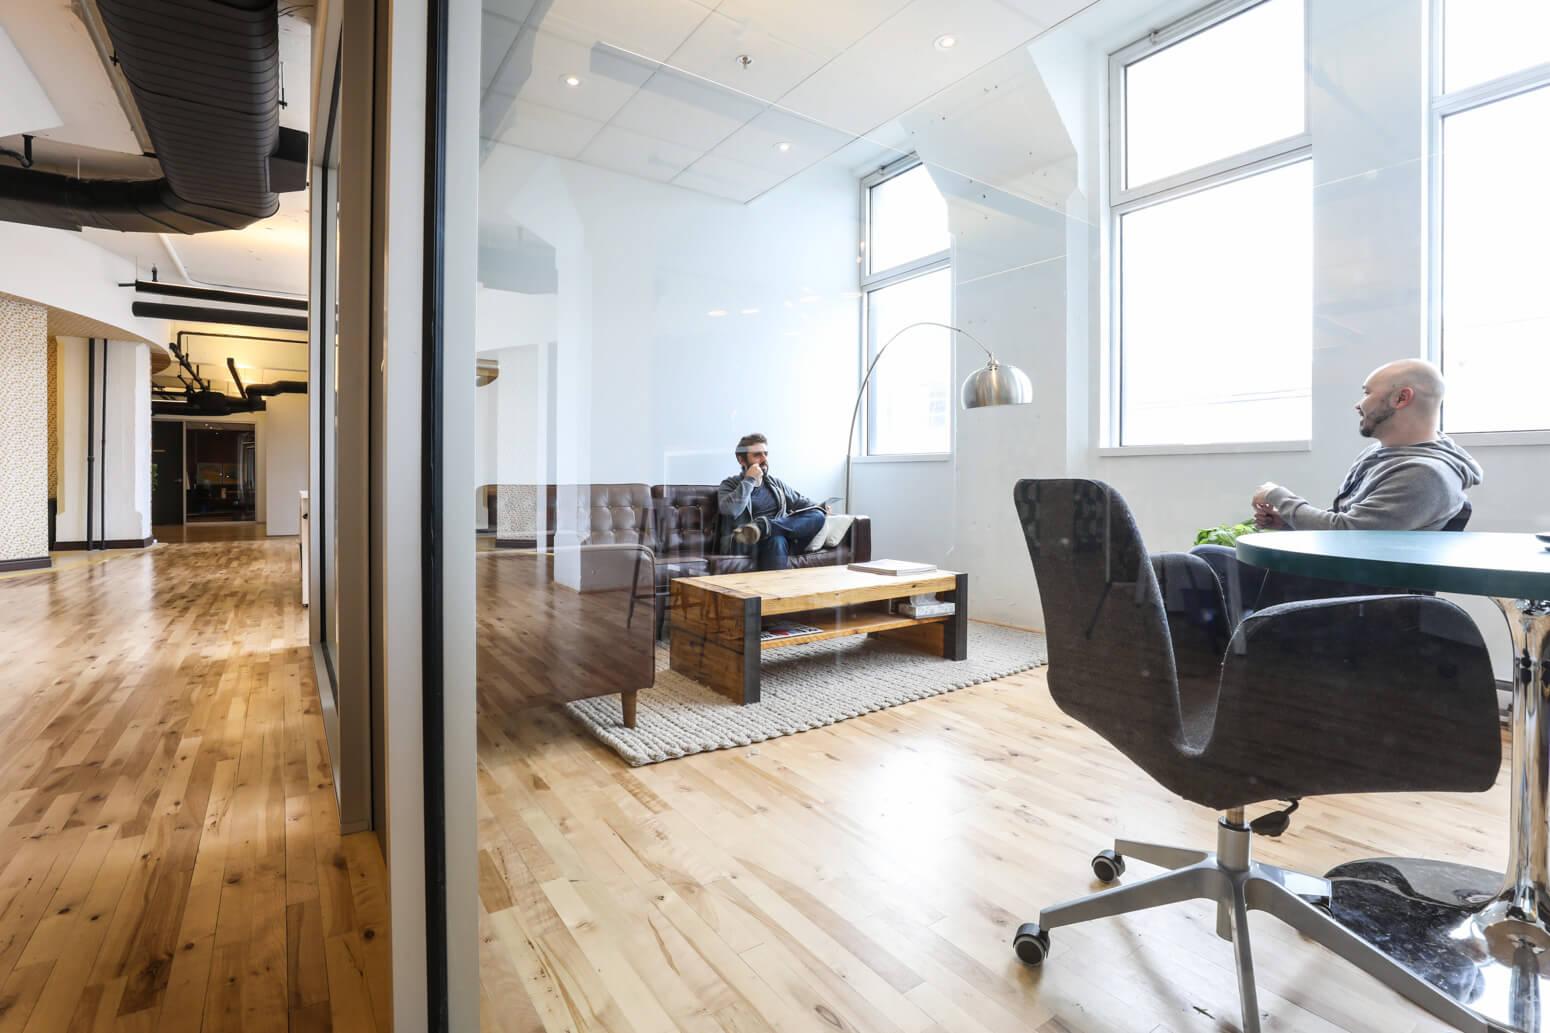 Shutterstock Montreal Office Killer Spaces-6